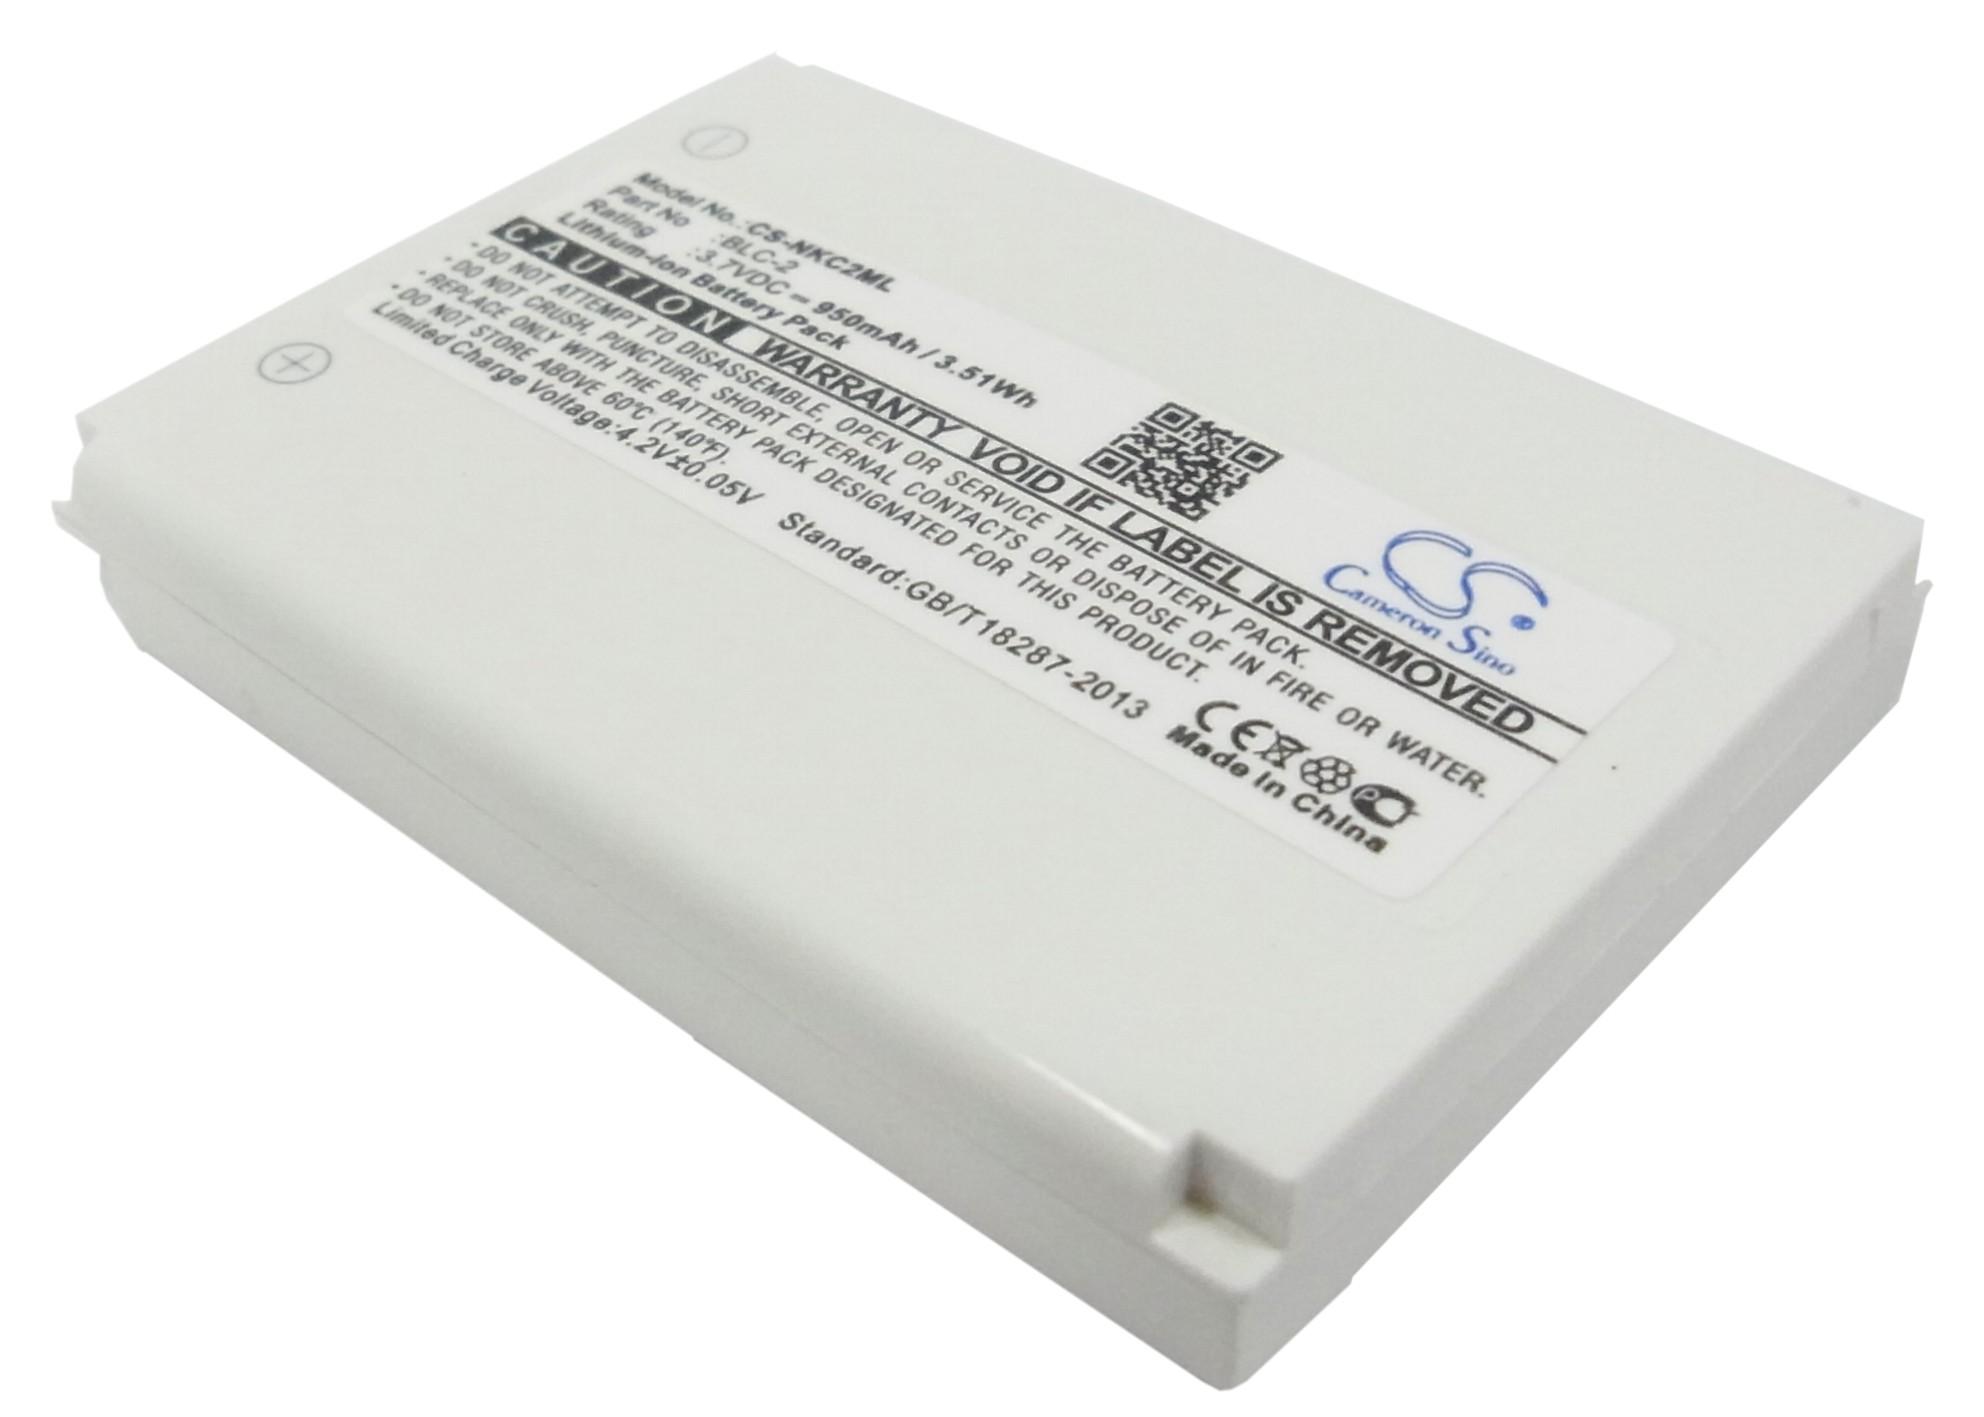 Cameron Sino baterie do mobilů pro NOKIA 3310 3.7V Li-ion 950mAh černá - neoriginální